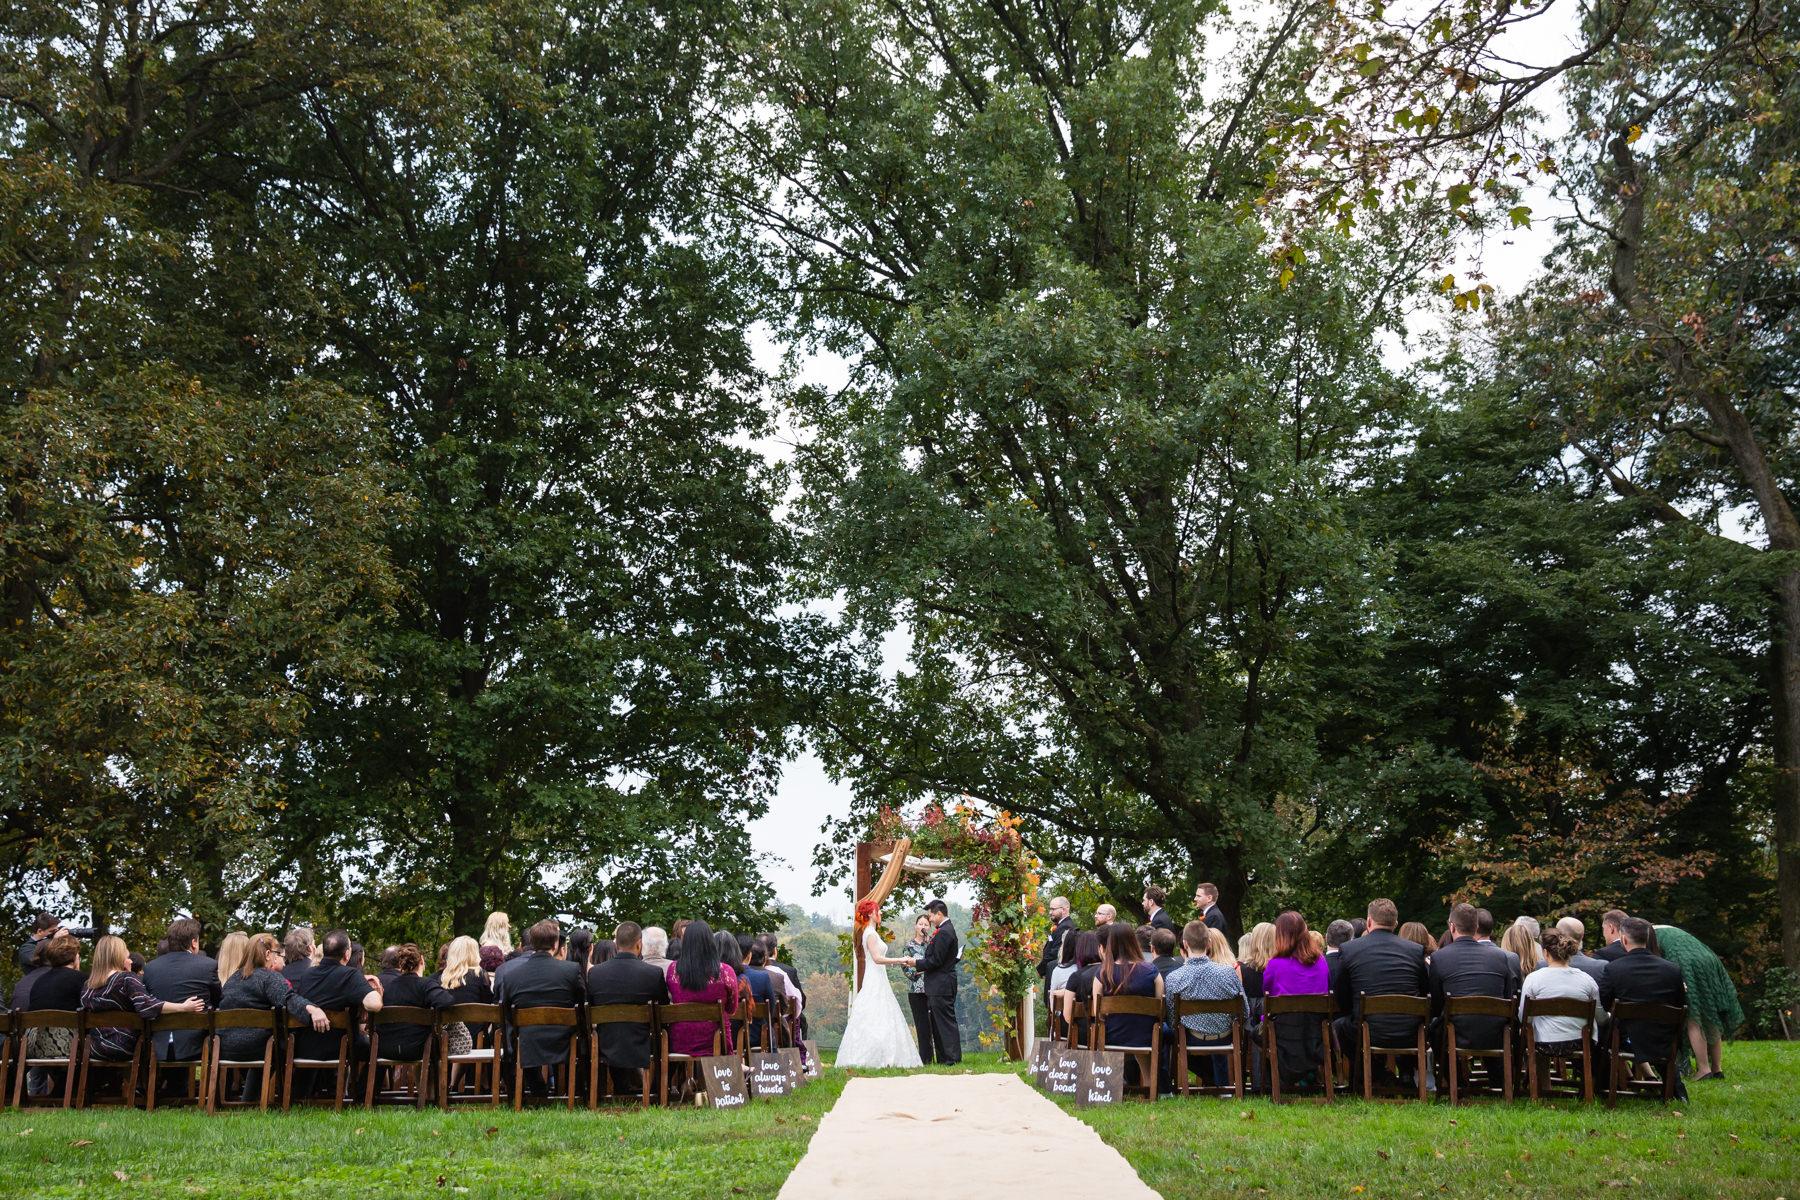 Outdoor Lawn Wedding Ceremony At The Morris Arboretum In Philadelphia Pa